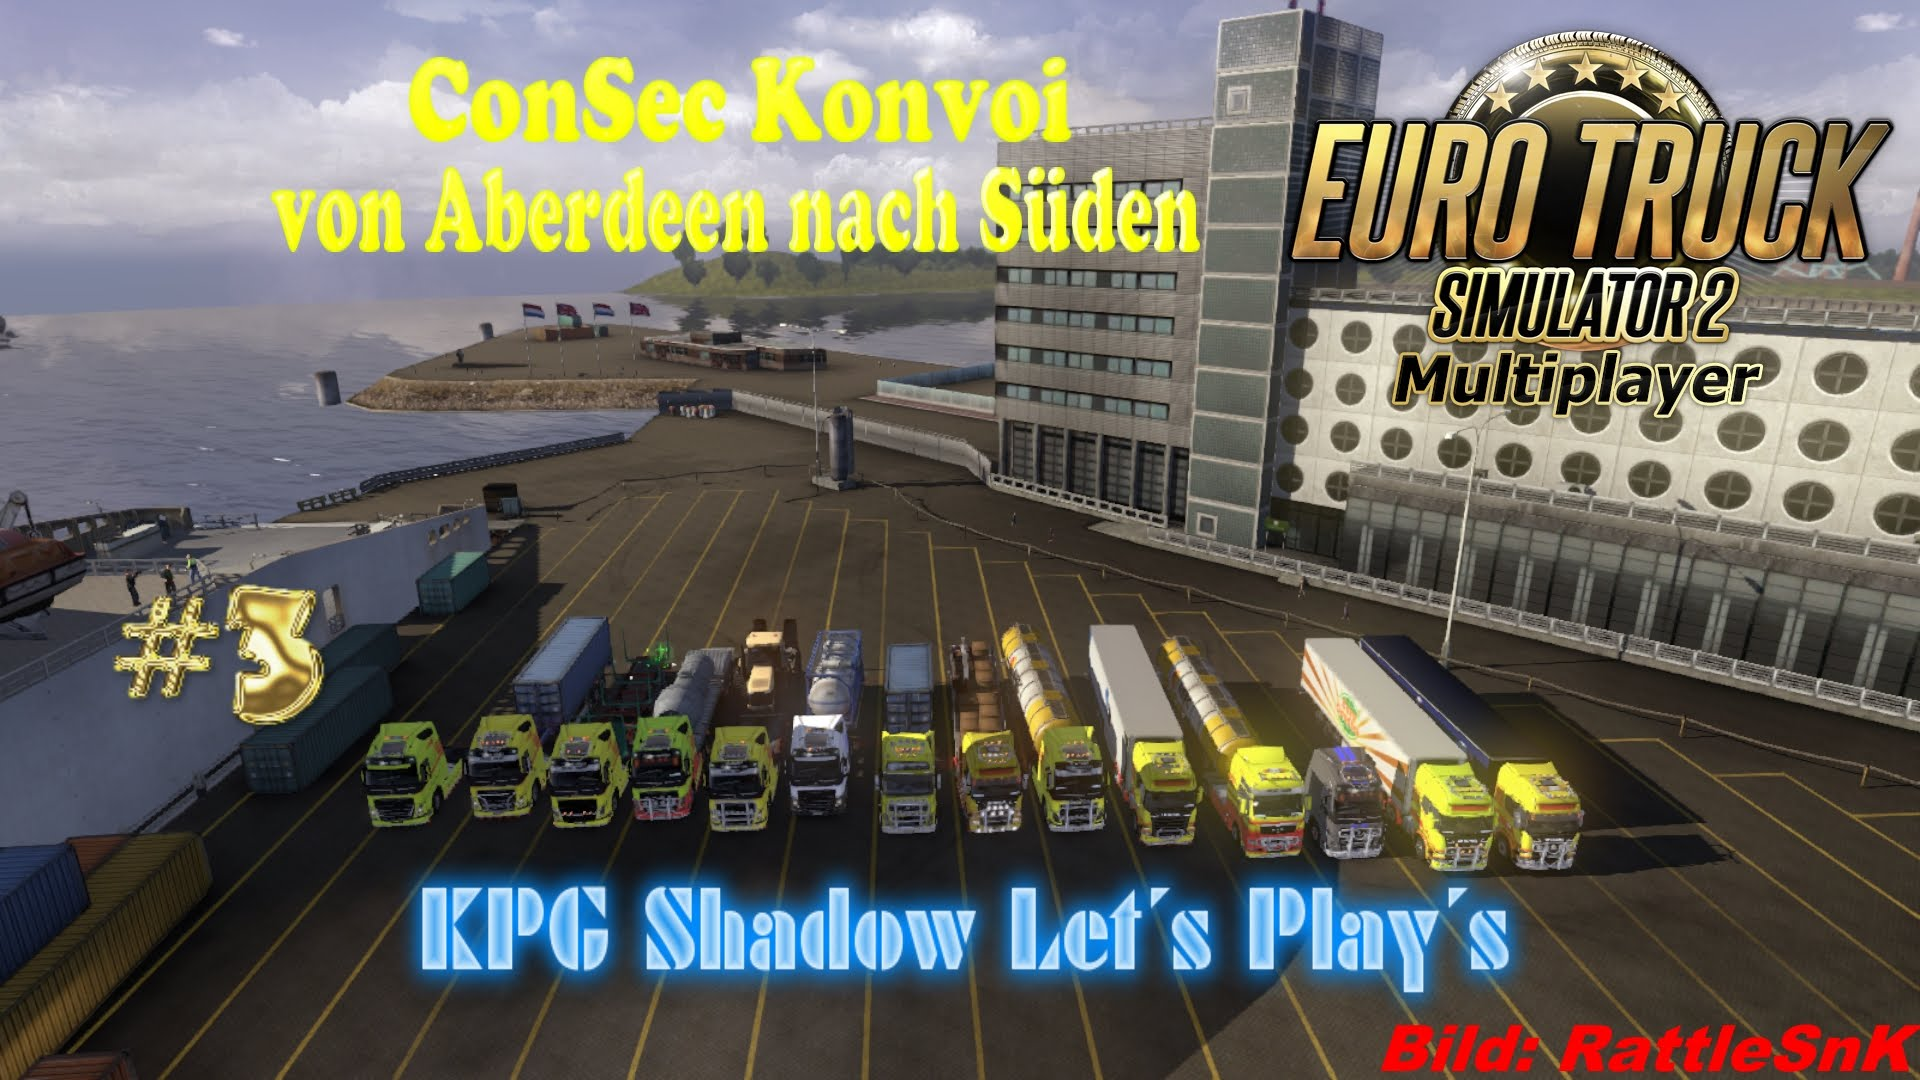 ConSec Konvoi (Aberdeen - Süden)★ ETS2 Multiplayer #3 ★